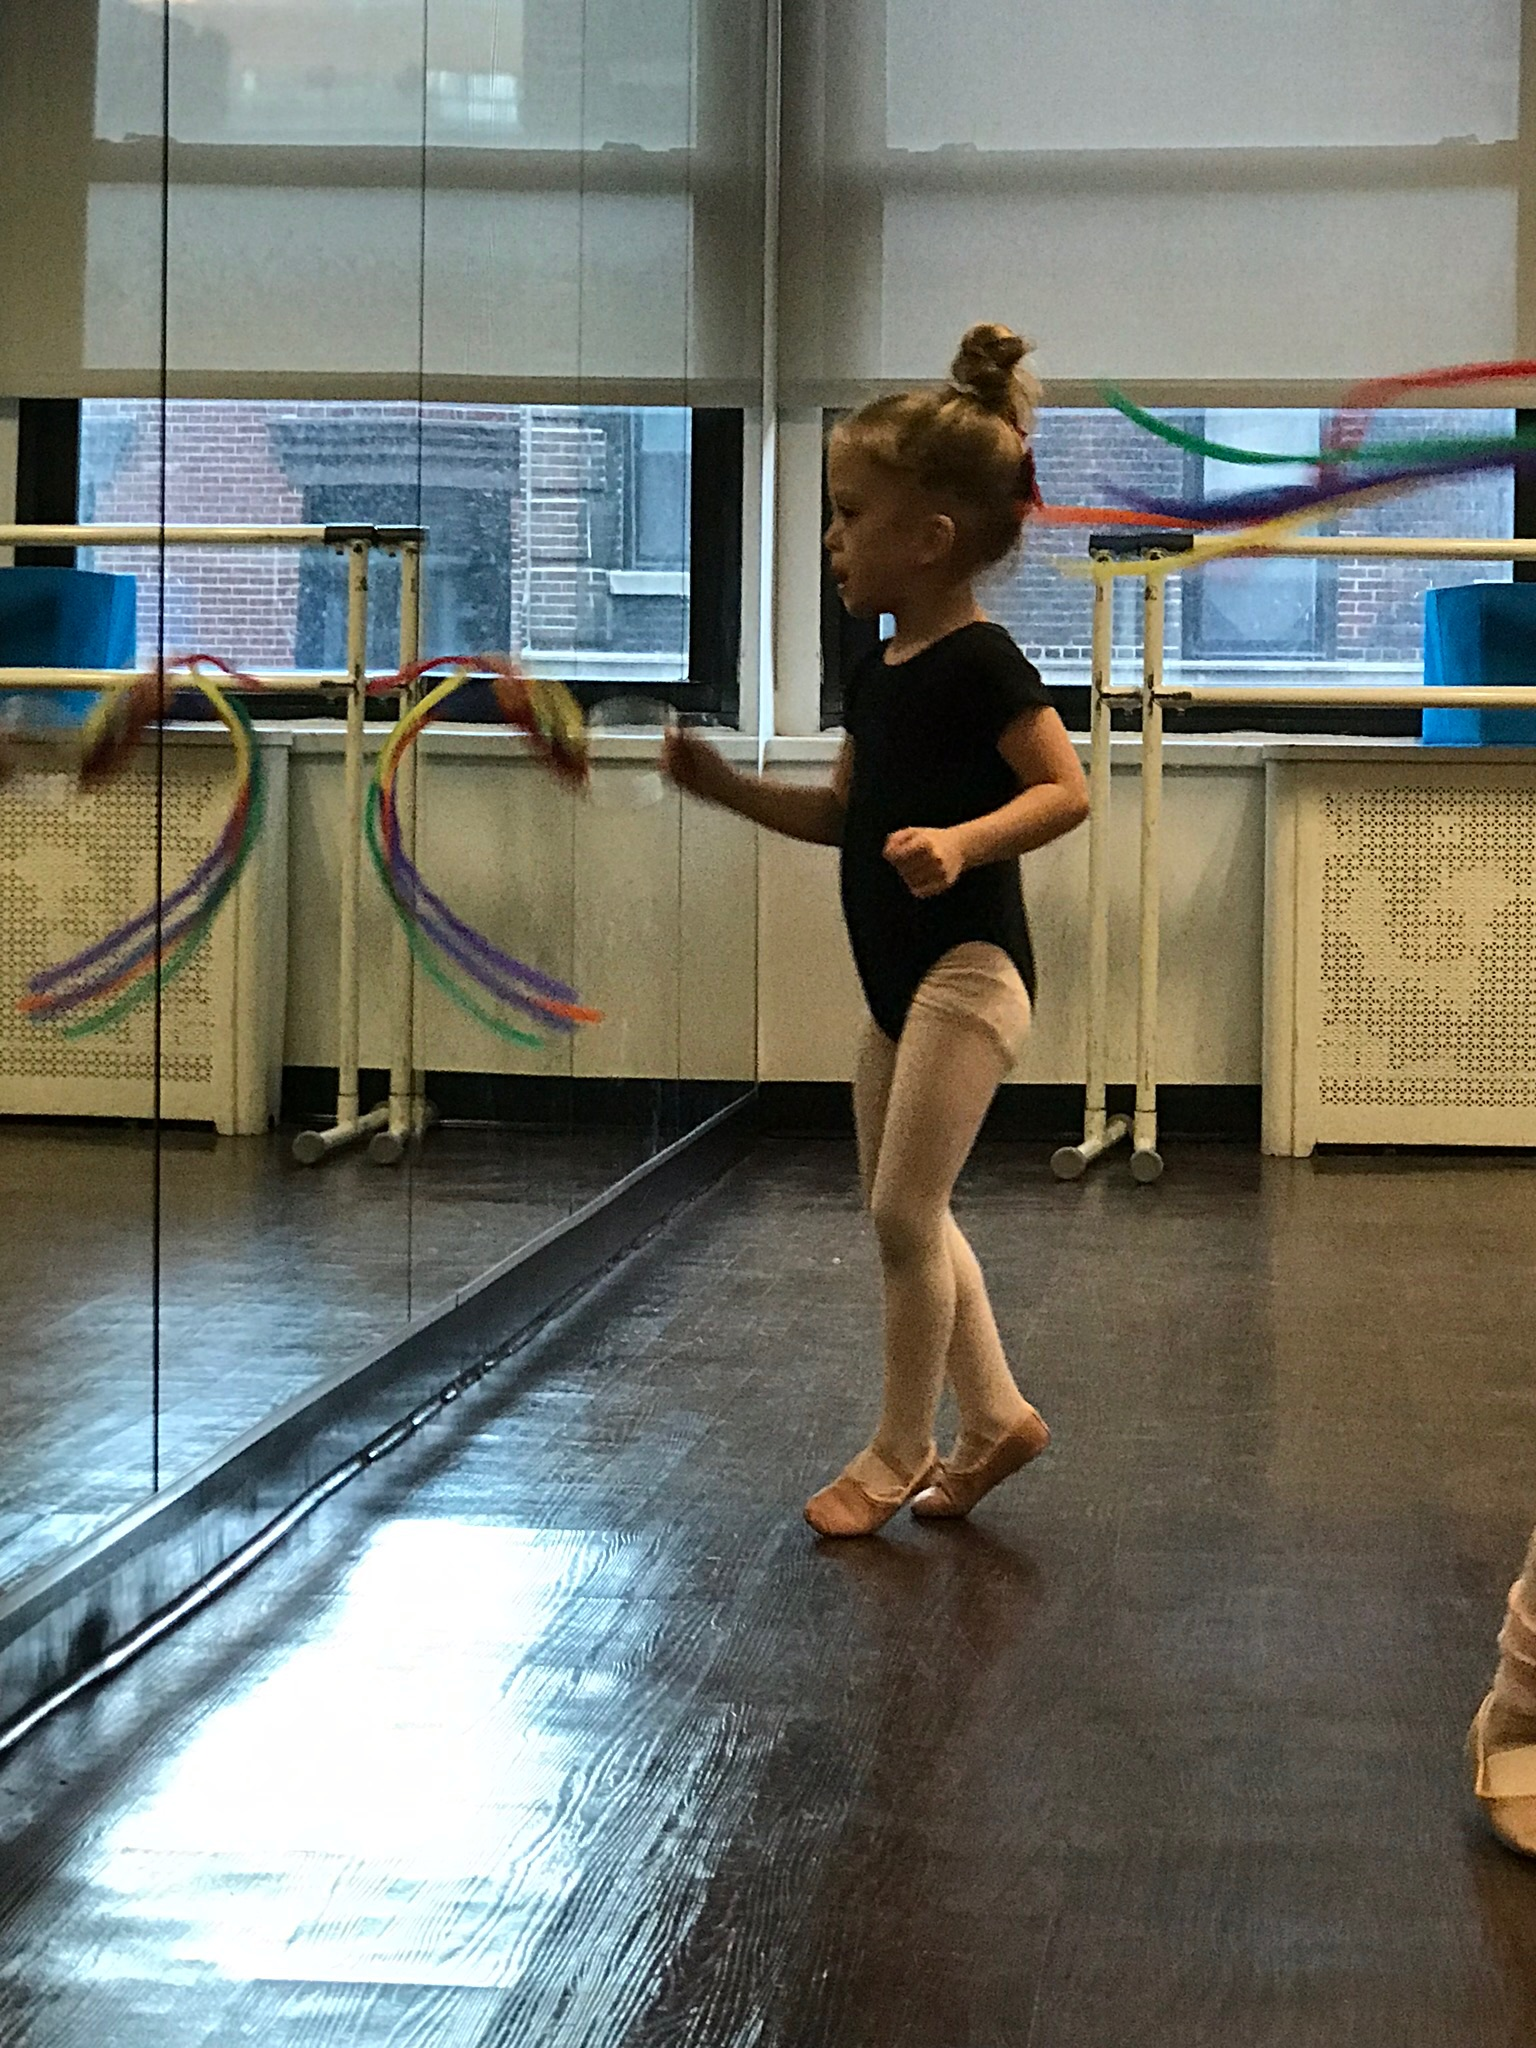 Friday evenings at ballet class